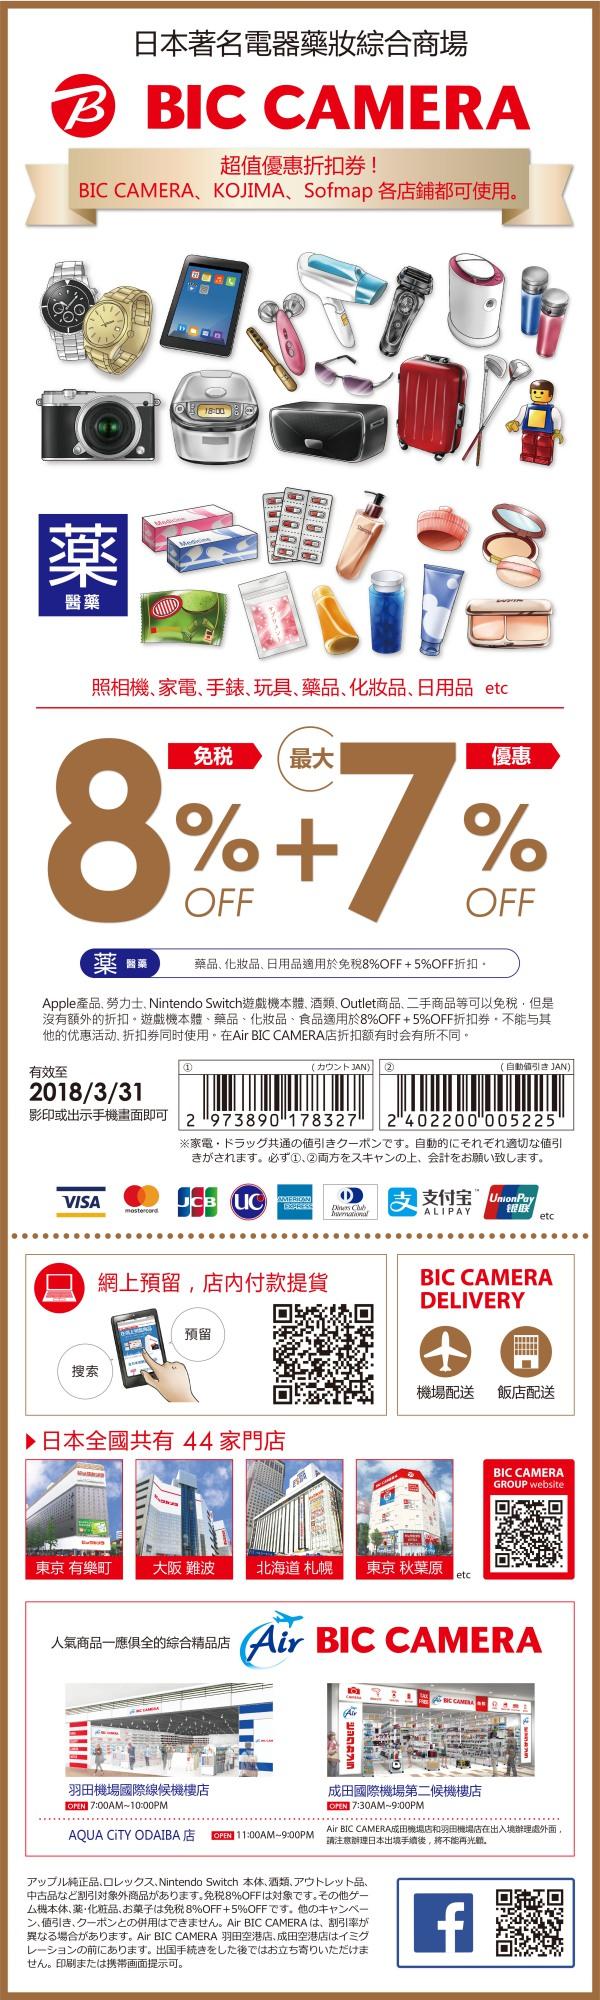 BIC CAMERA優惠券2017年2018年免稅8%加最多7%折扣樂吃購!日本讀者專屬